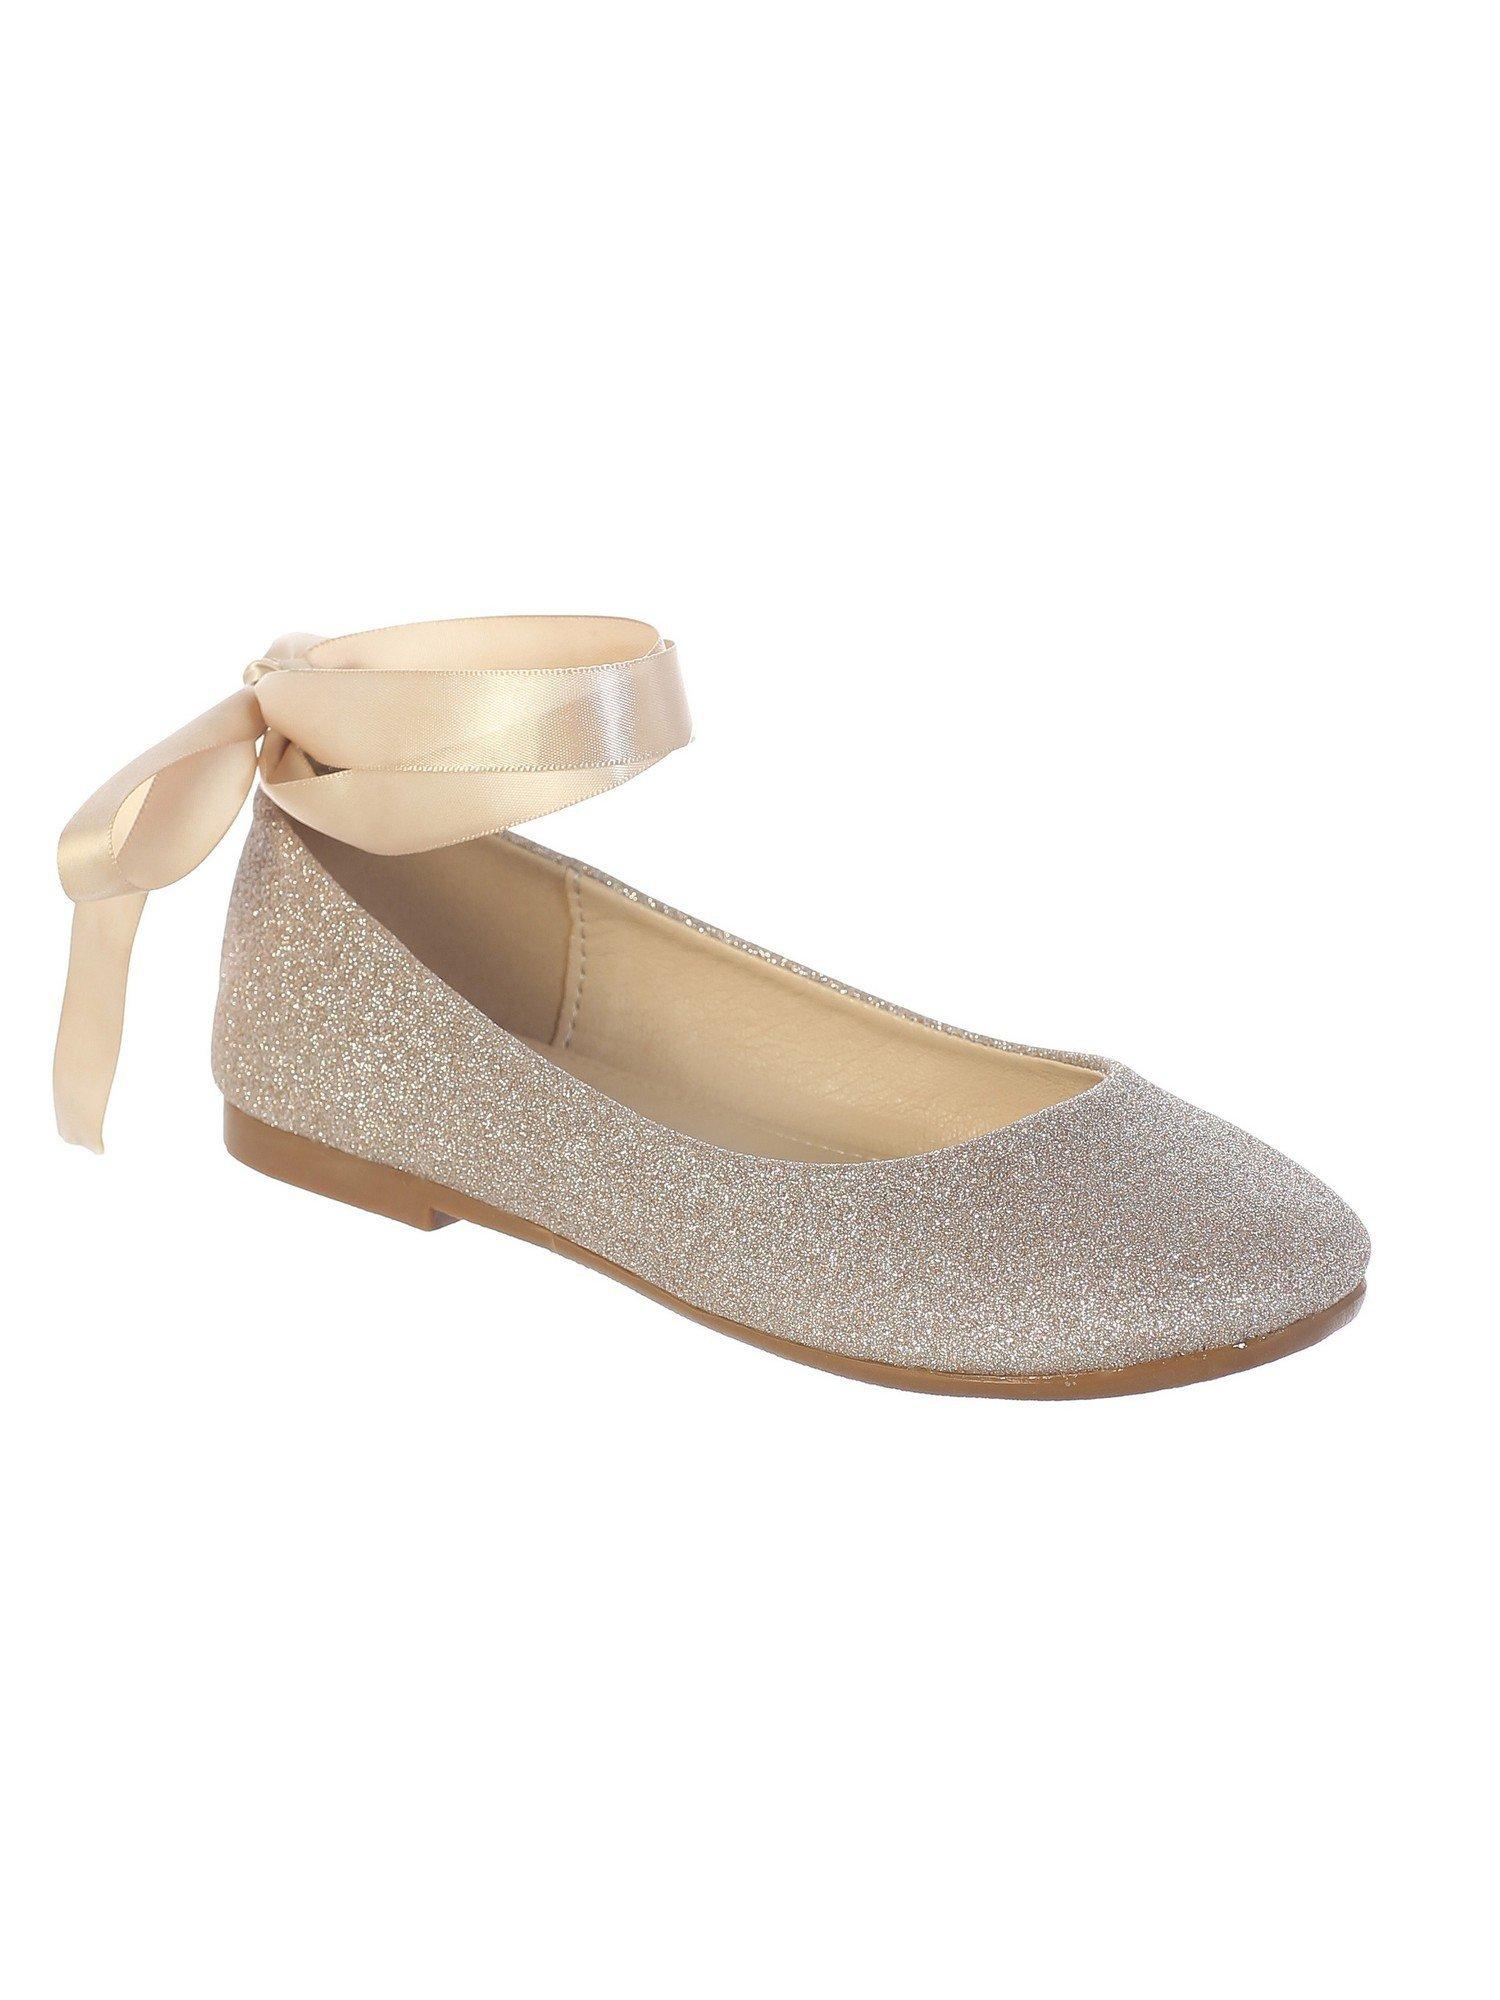 Girls Rose Gold Glitter Satin Ribbon Ankle Ties Ballerina Shoes 3 Kids